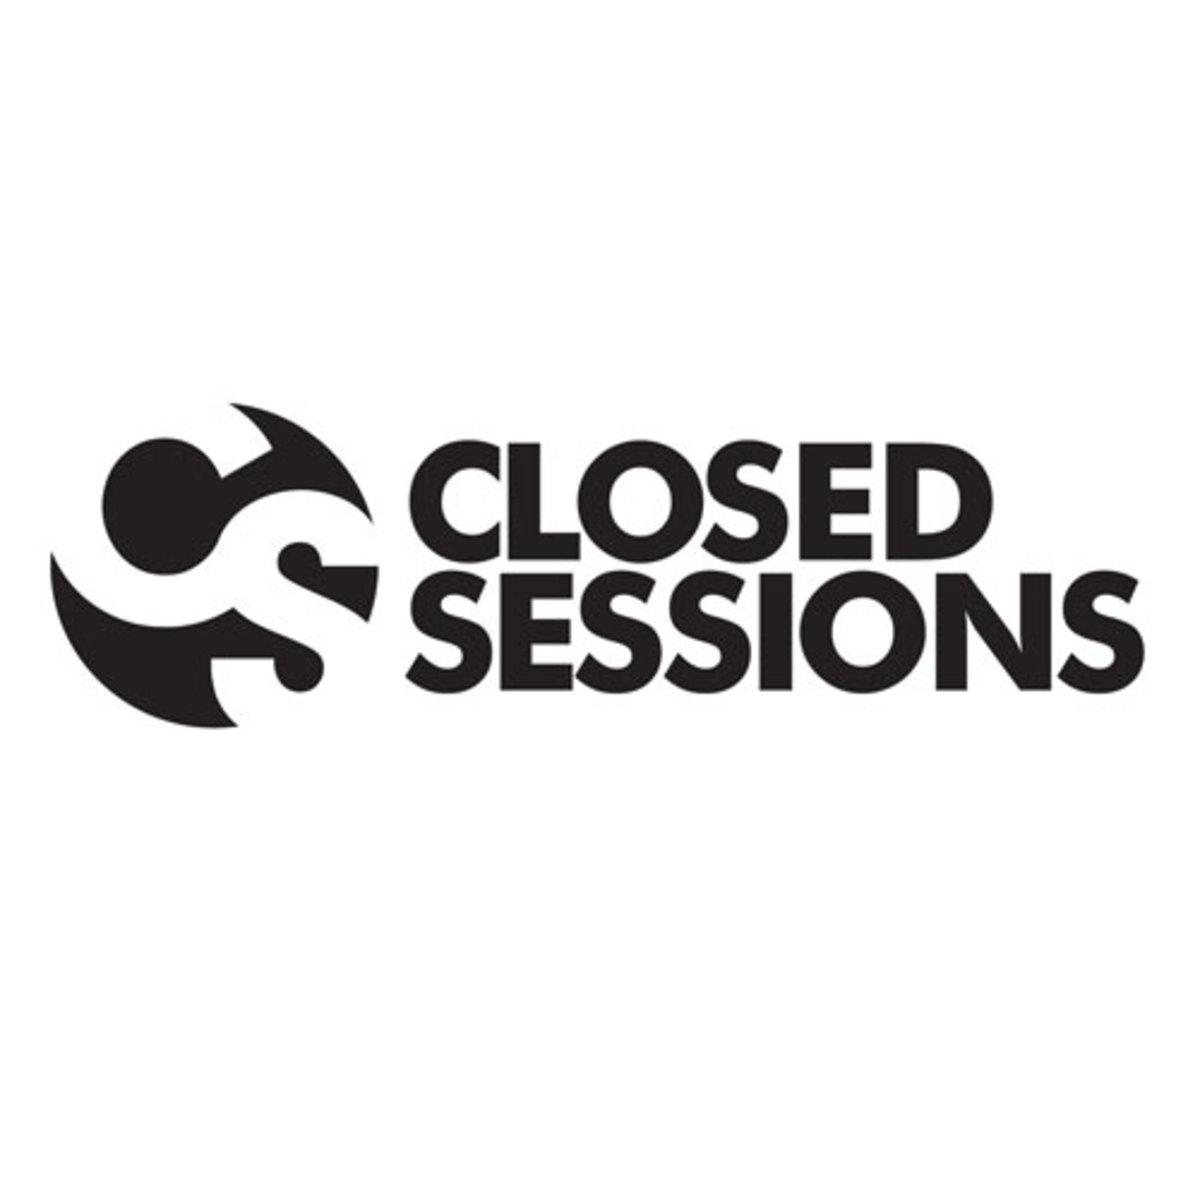 closedsessionslogo.jpg